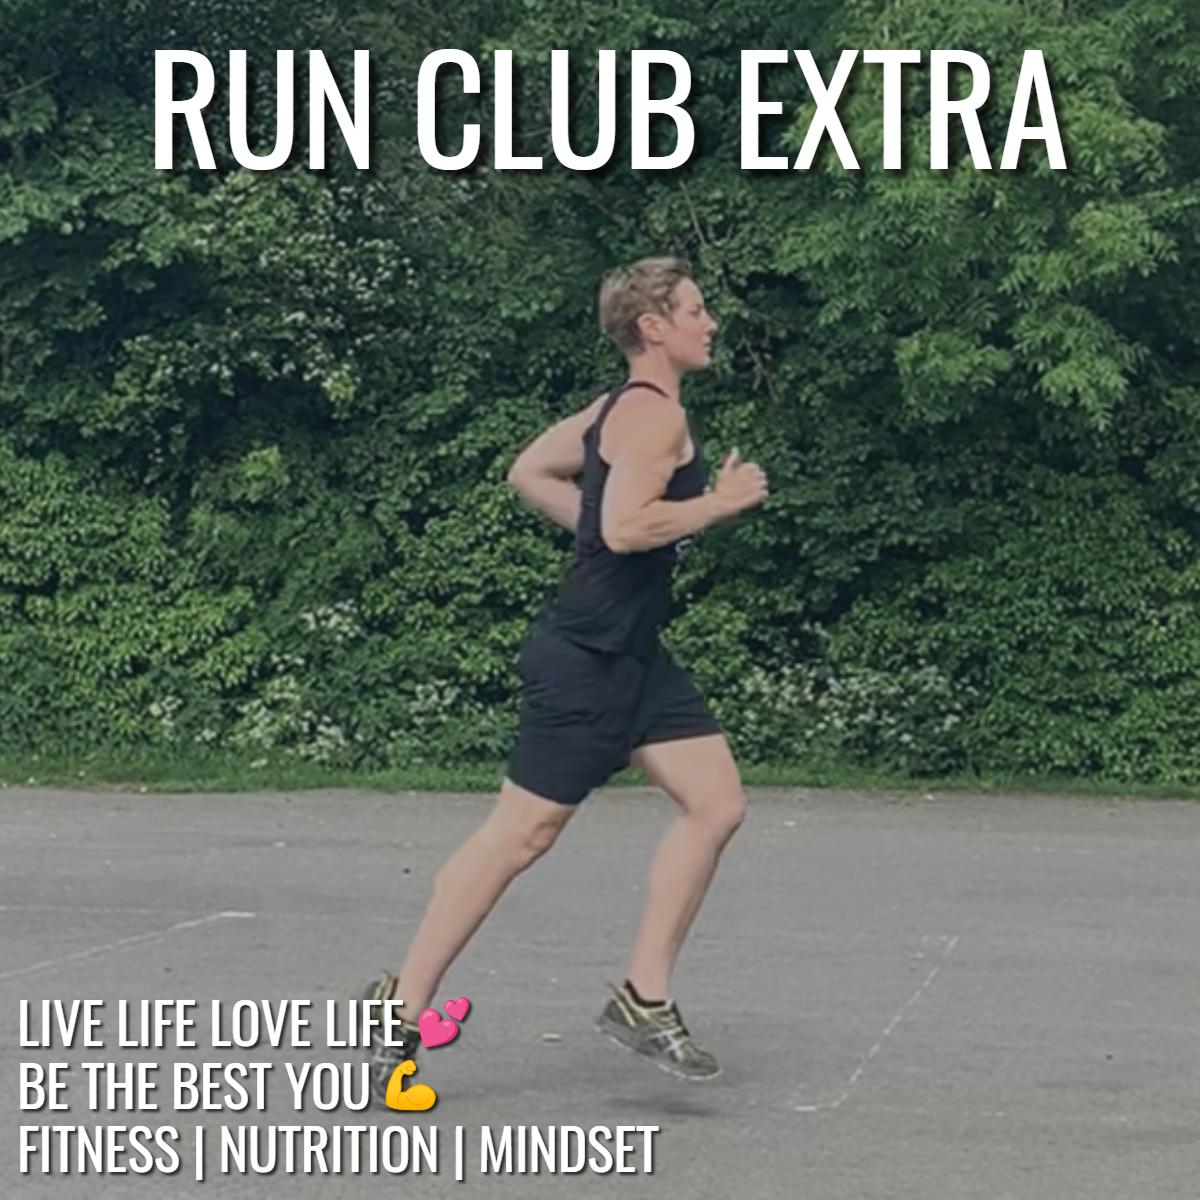 Run Club Extra